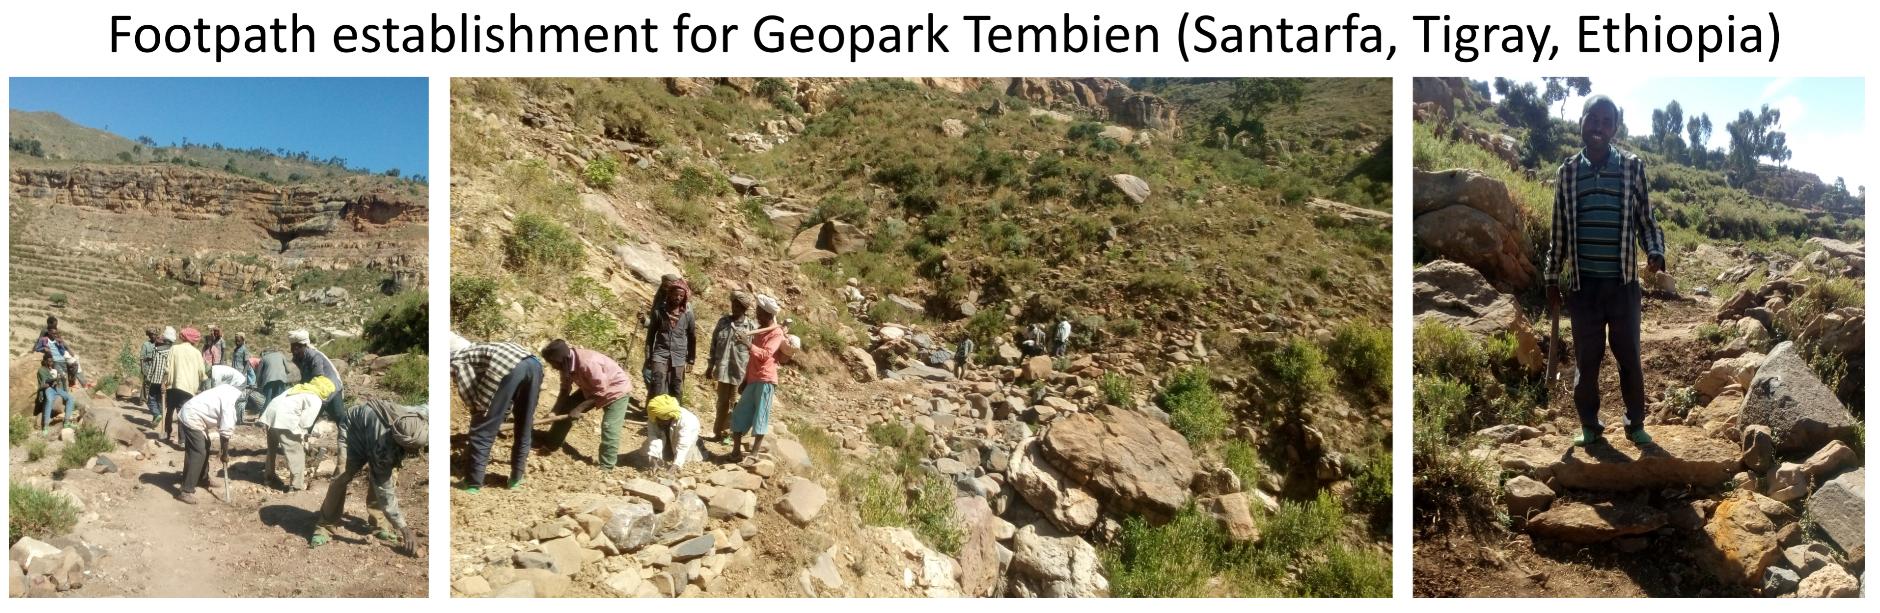 Footpath establishment for Geopark Tembien (Santarfa, Tigray, Ethiopia)